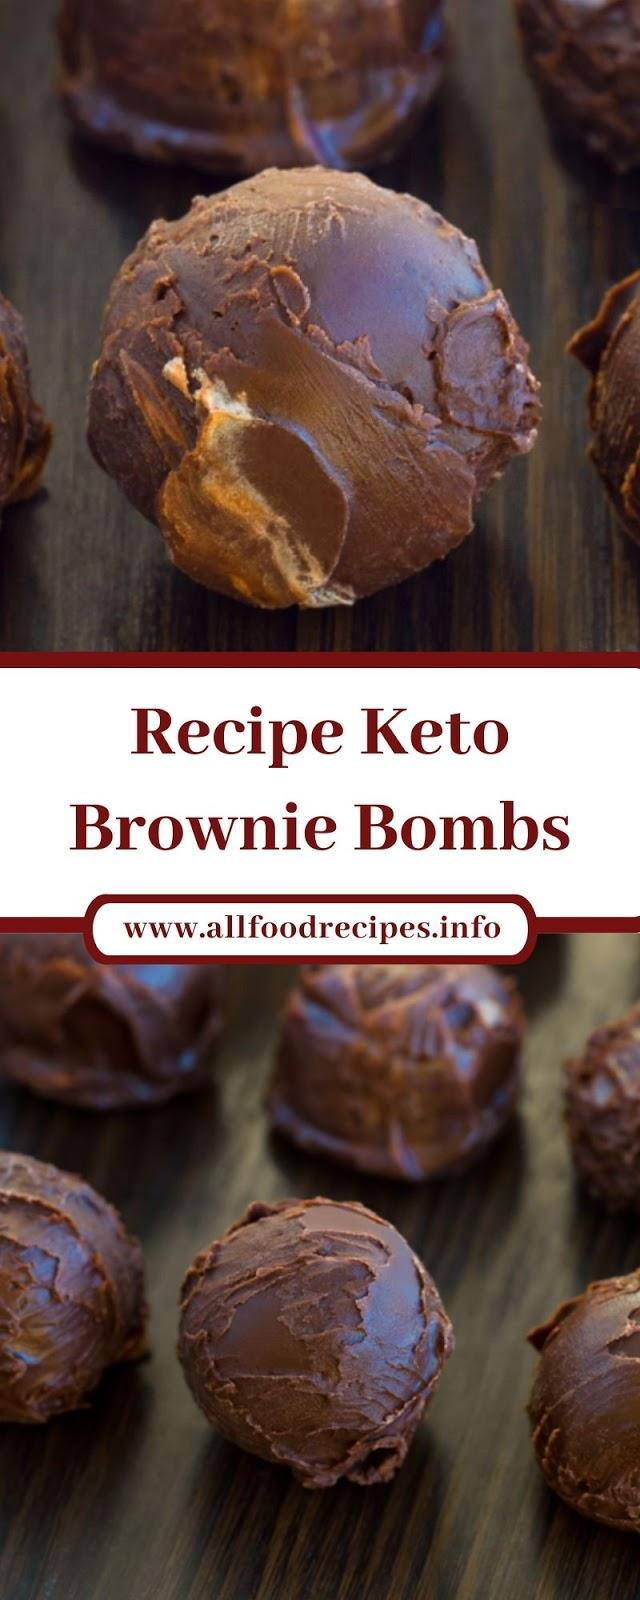 Recipe Keto Brownie Bombs